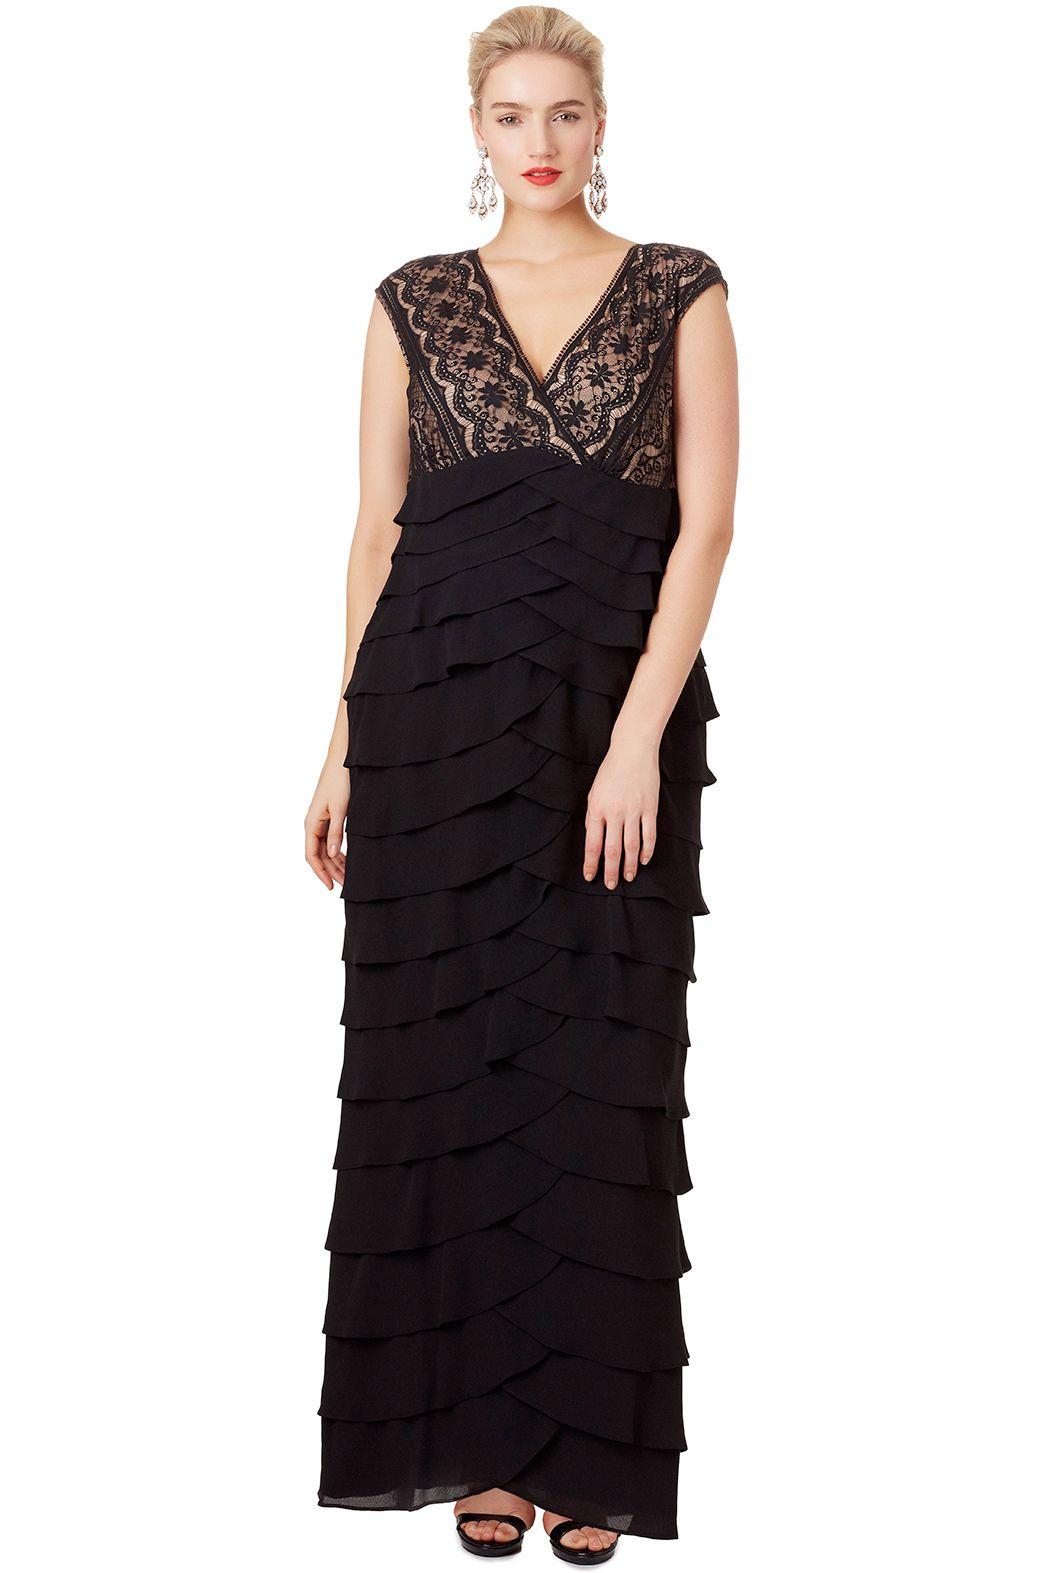 Adrianna Papell Black Scallop Gown Evening Wear Dresses Dresses Winter Wedding Guest Dress [ 1573 x 1049 Pixel ]